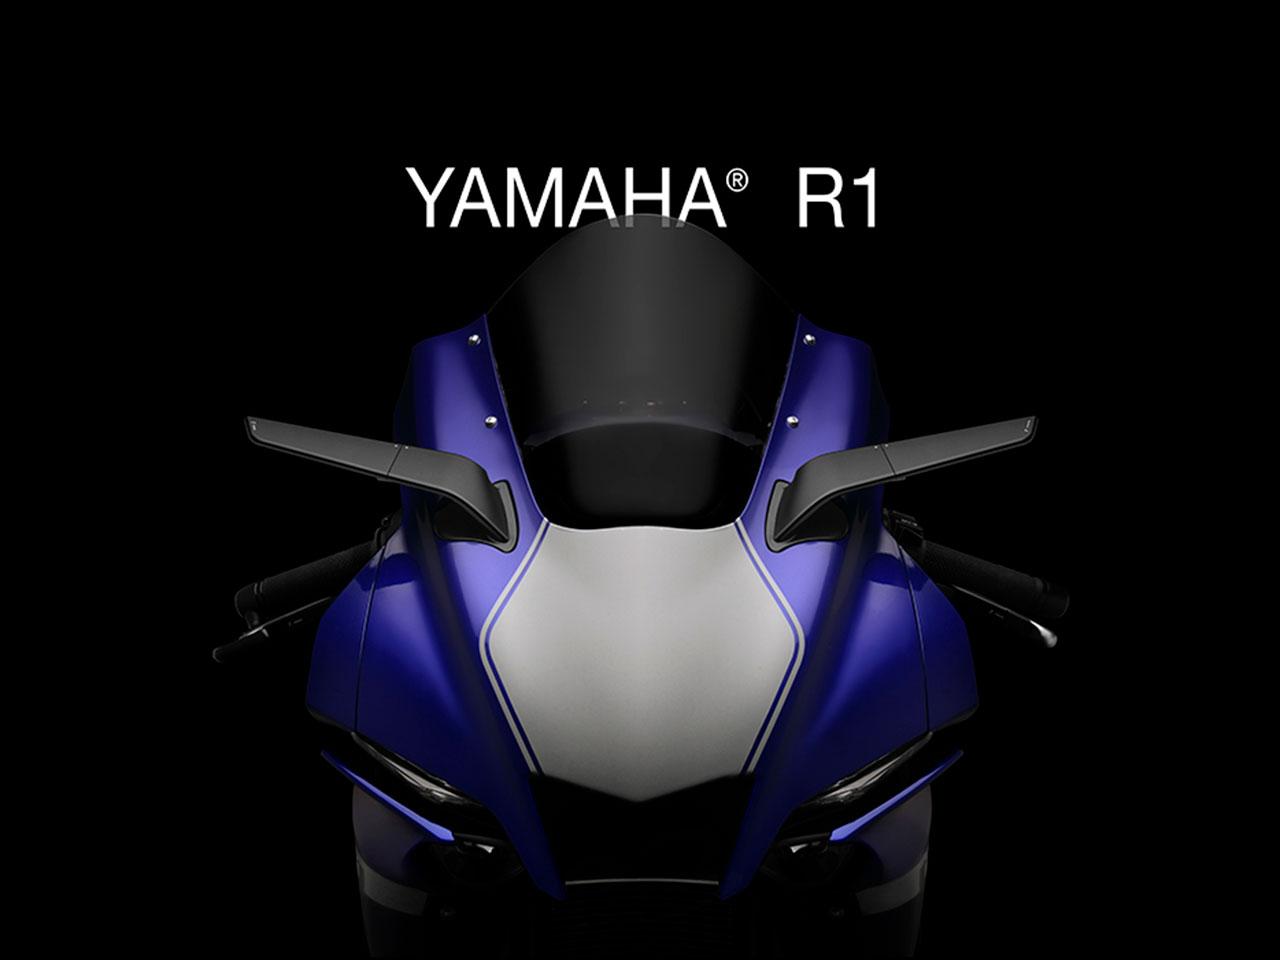 rizoma / リゾマ ミラー 「ステルス / STEALTH」YAMAHA YZF-R1